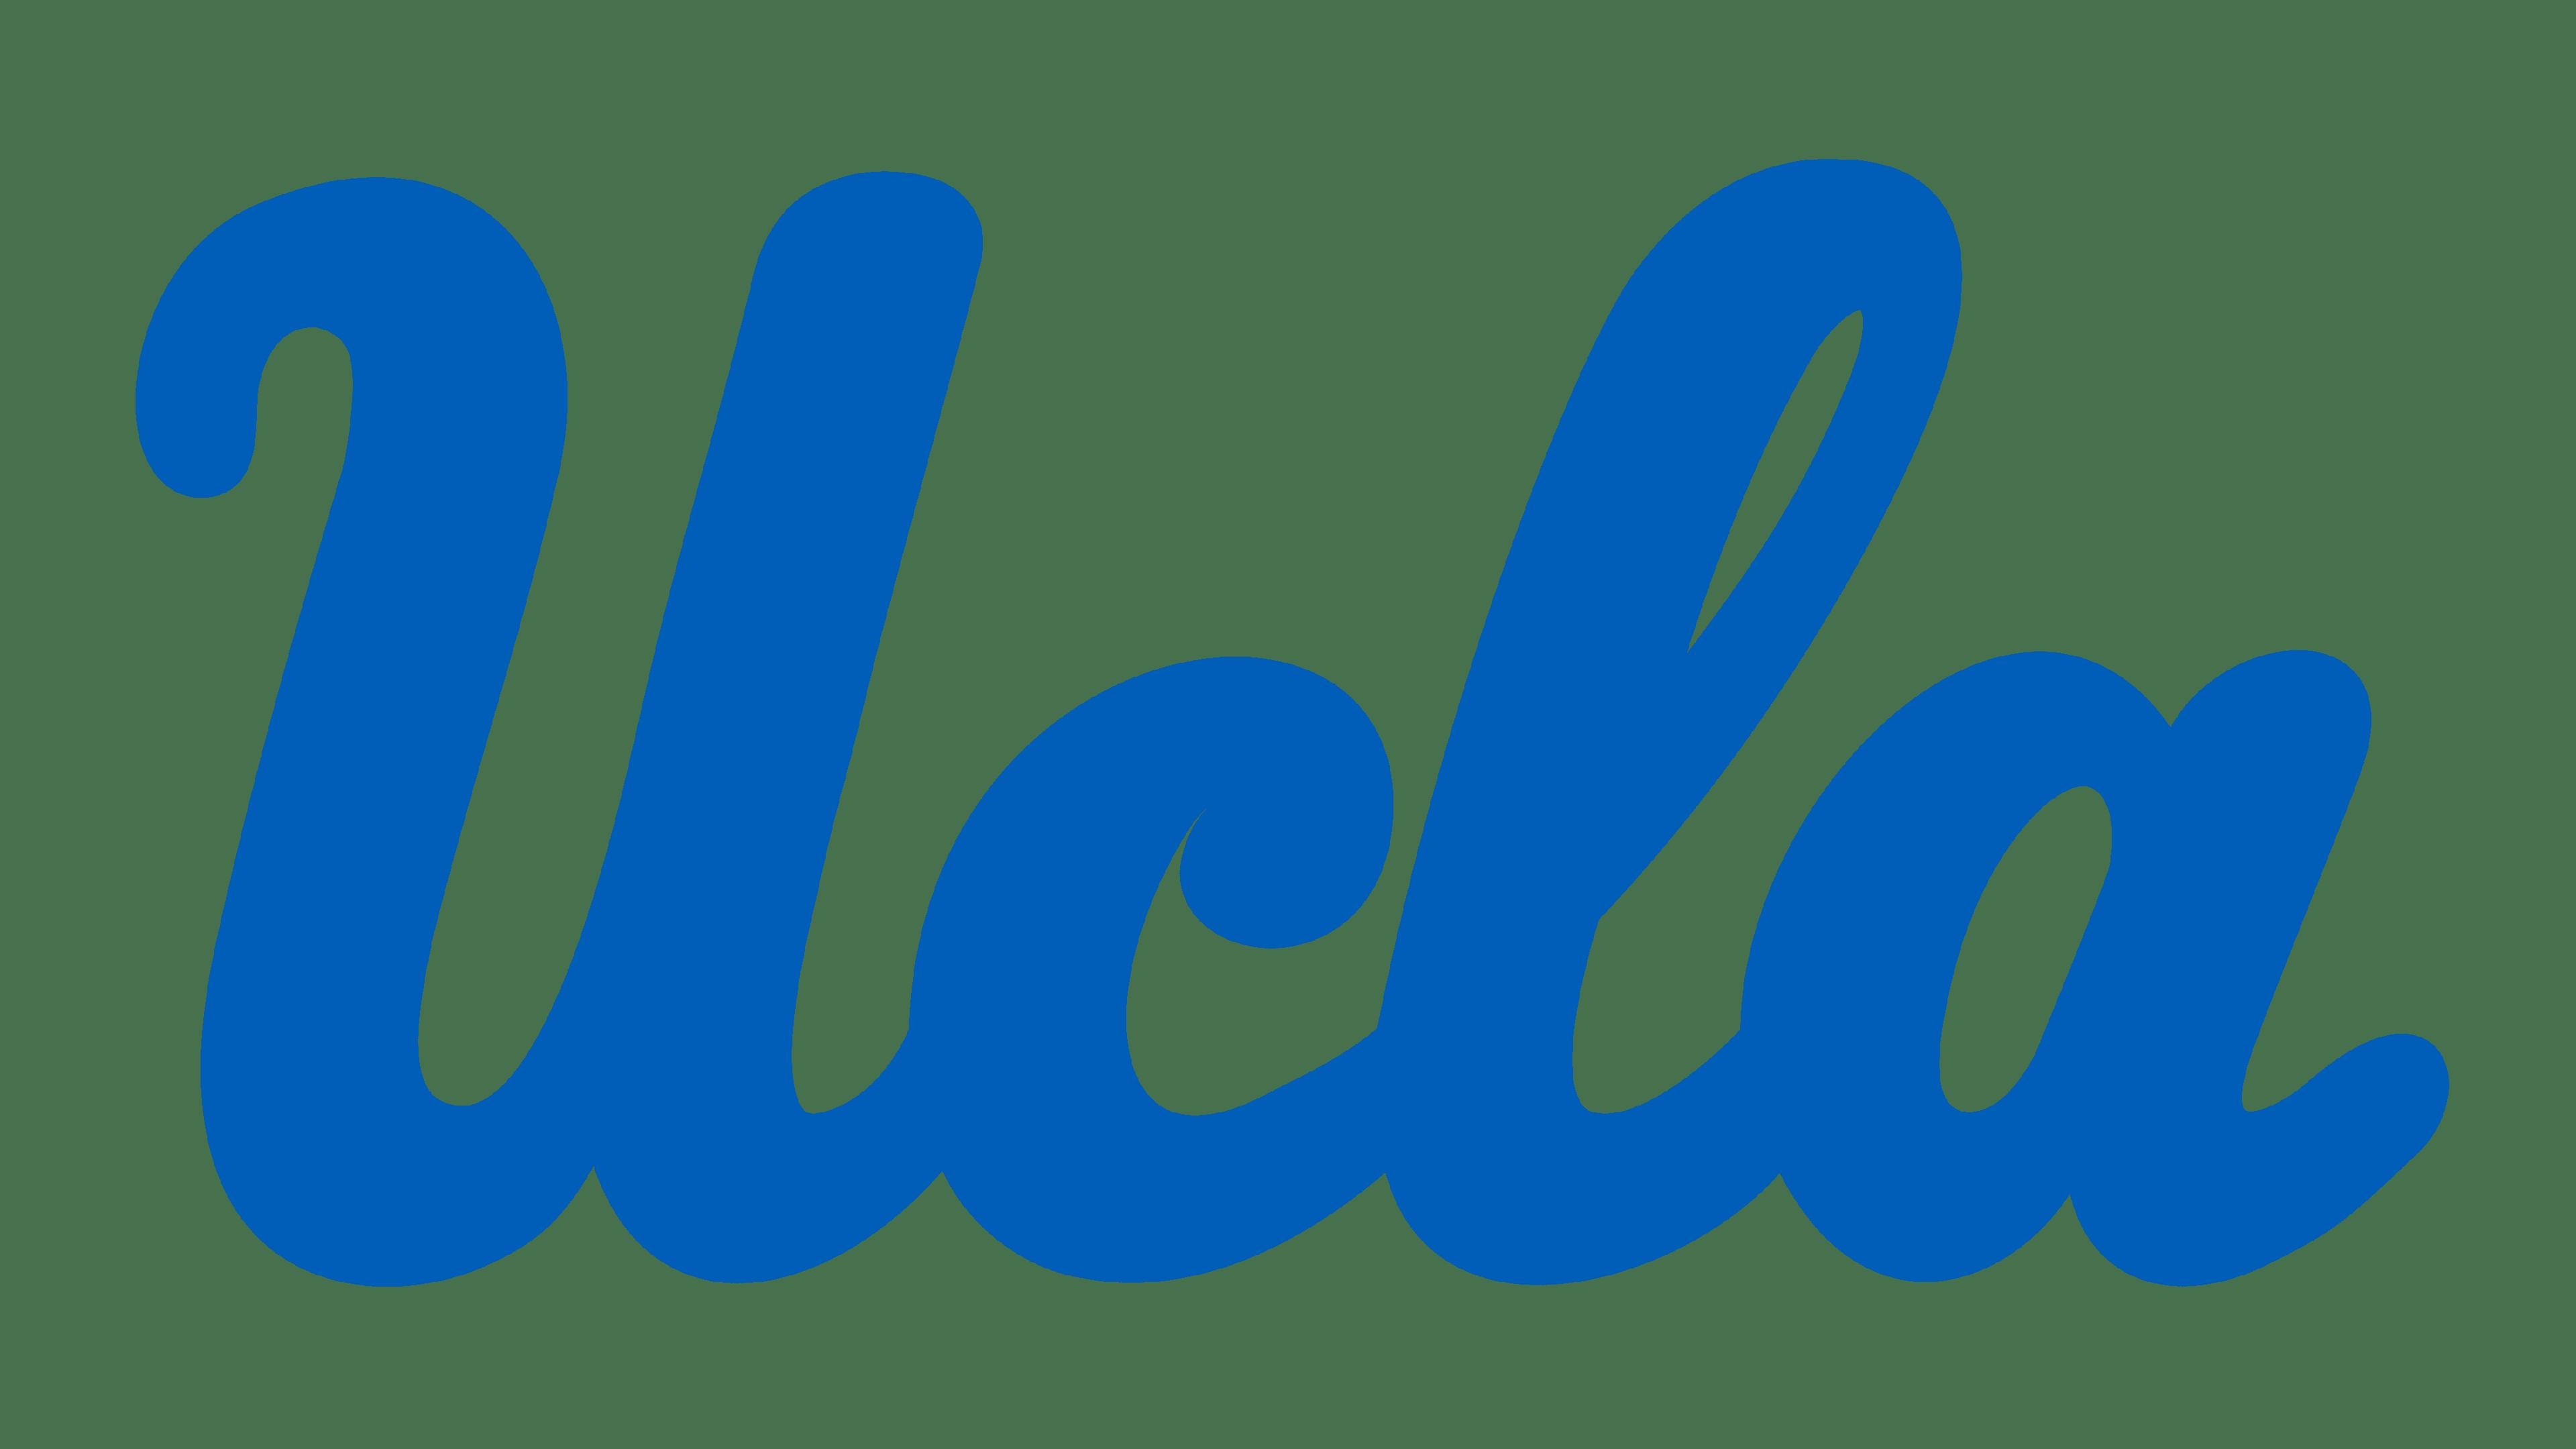 ucla logo ucla symbol meaning history and evolution